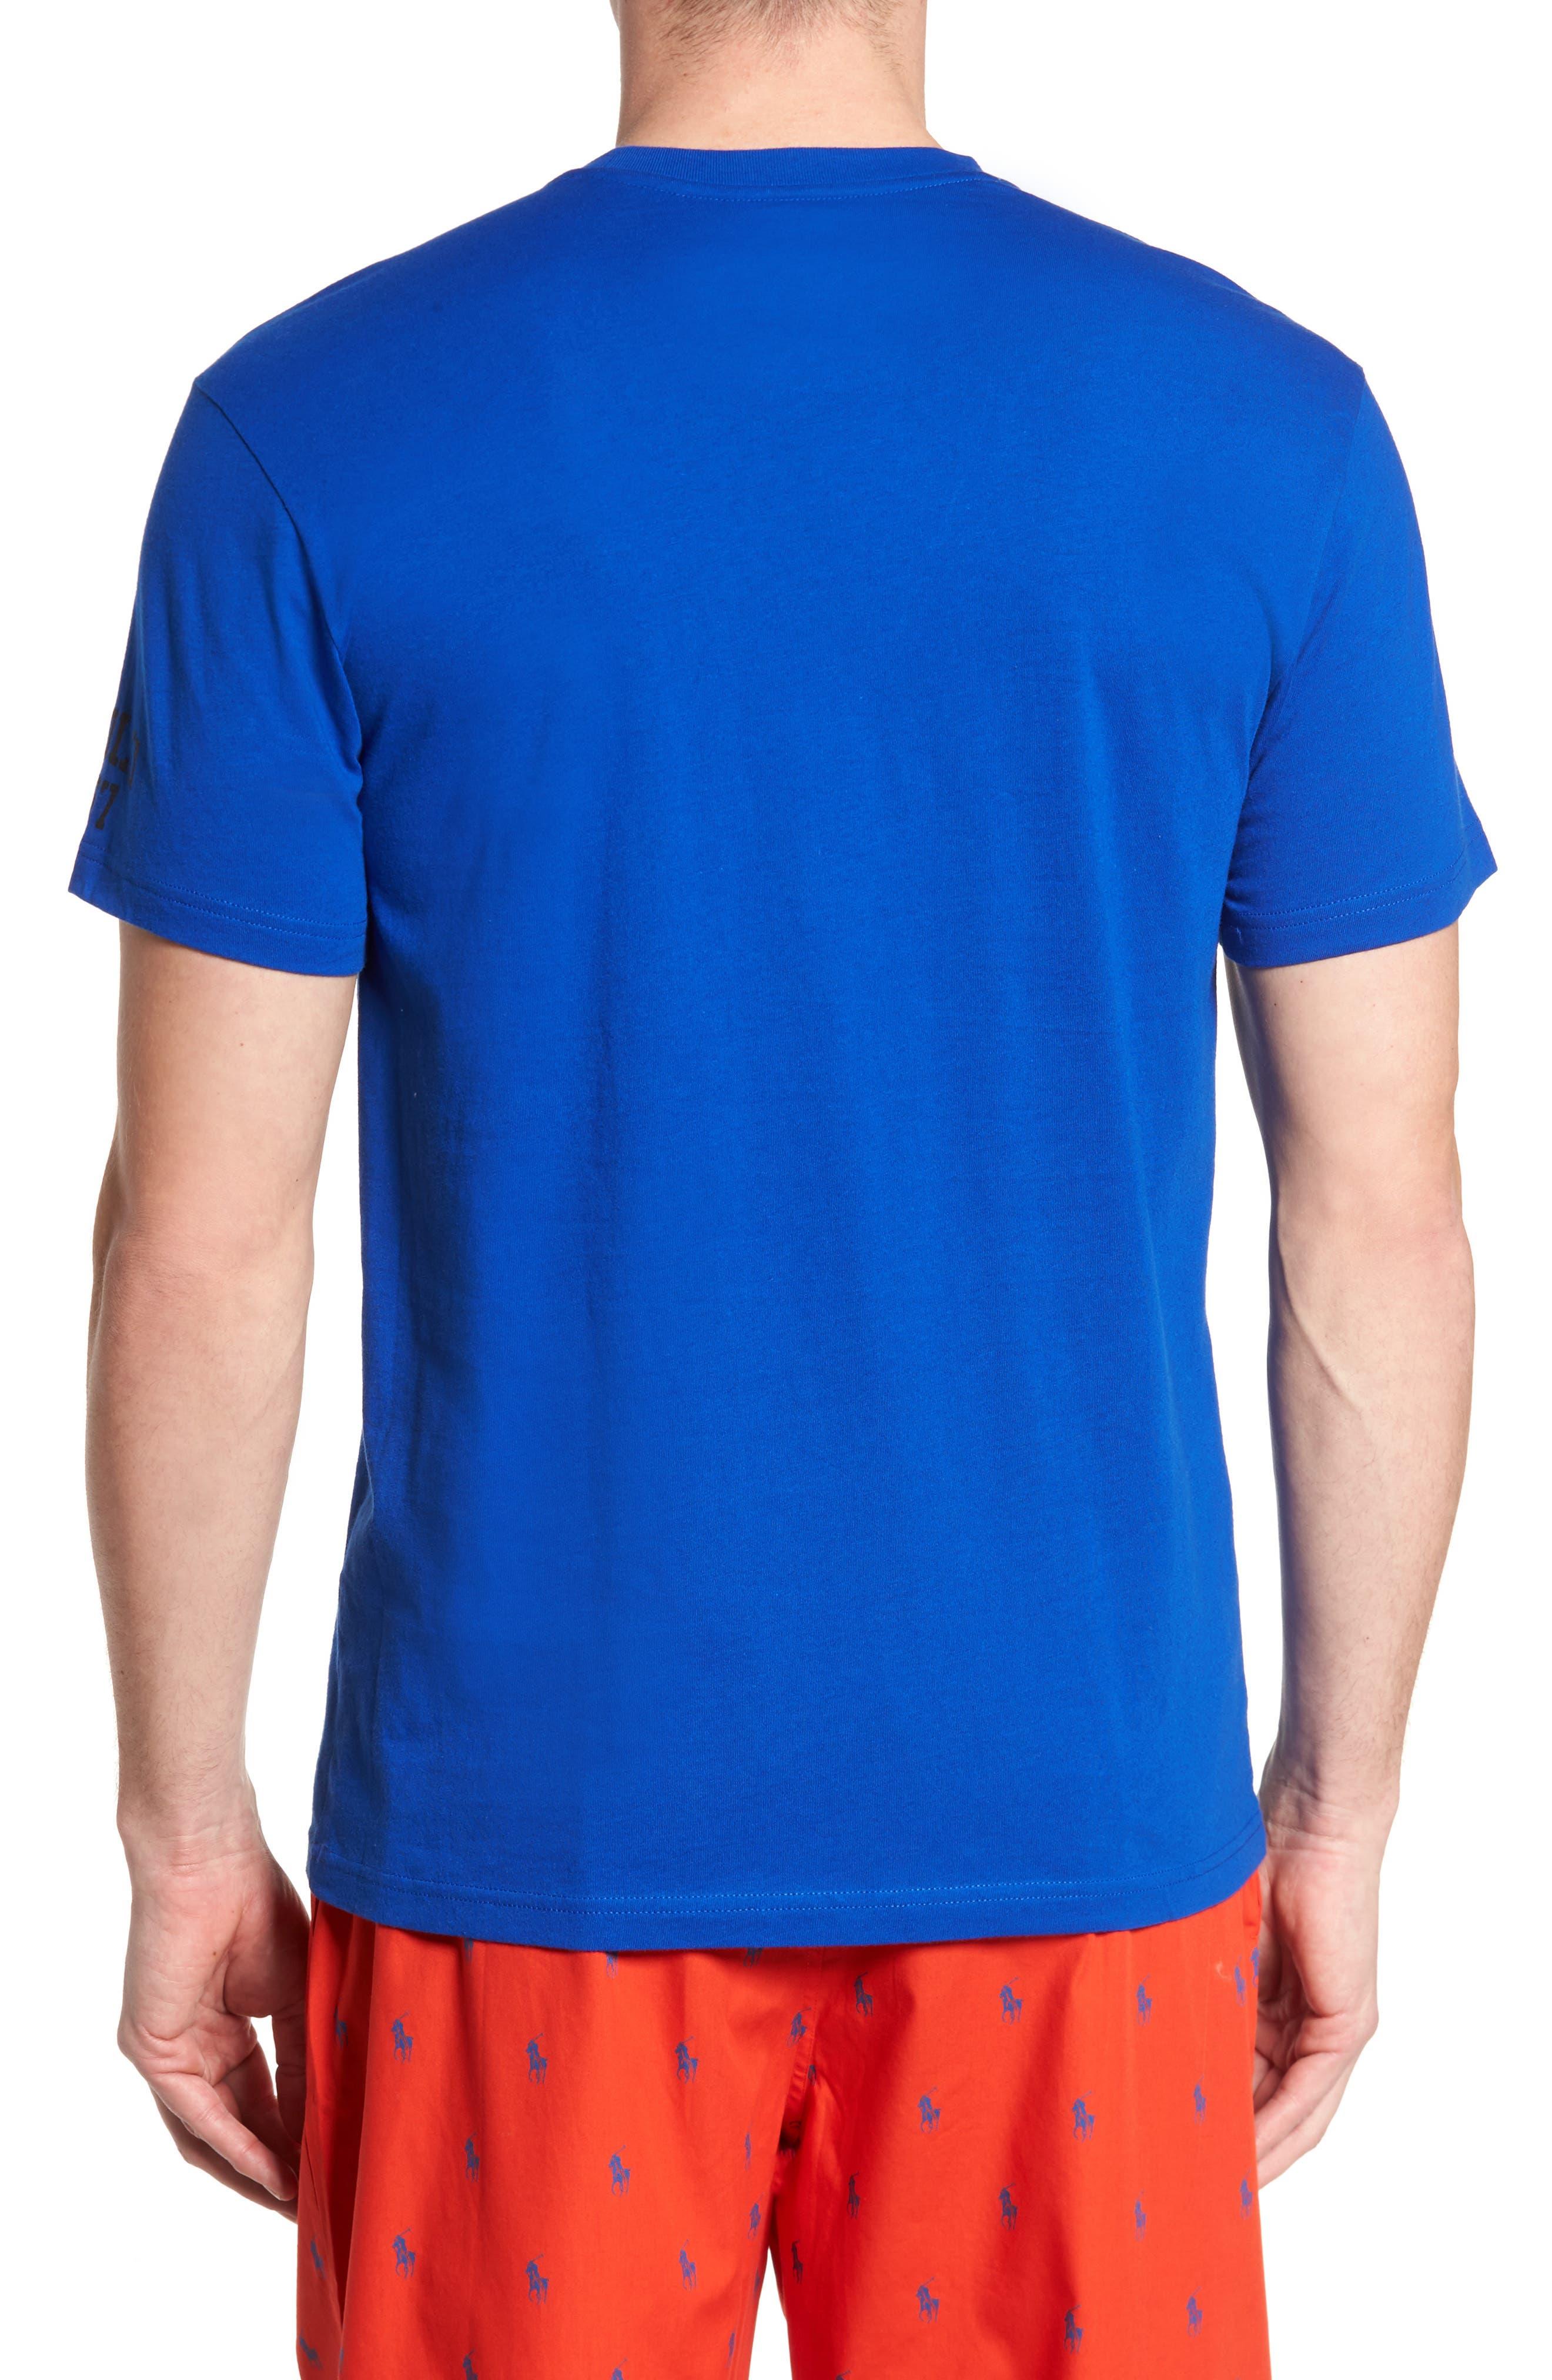 Polo Ralph Lauren Crewneck T-Shirt,                             Alternate thumbnail 2, color,                             Sapphire Star/ Crescent Cream